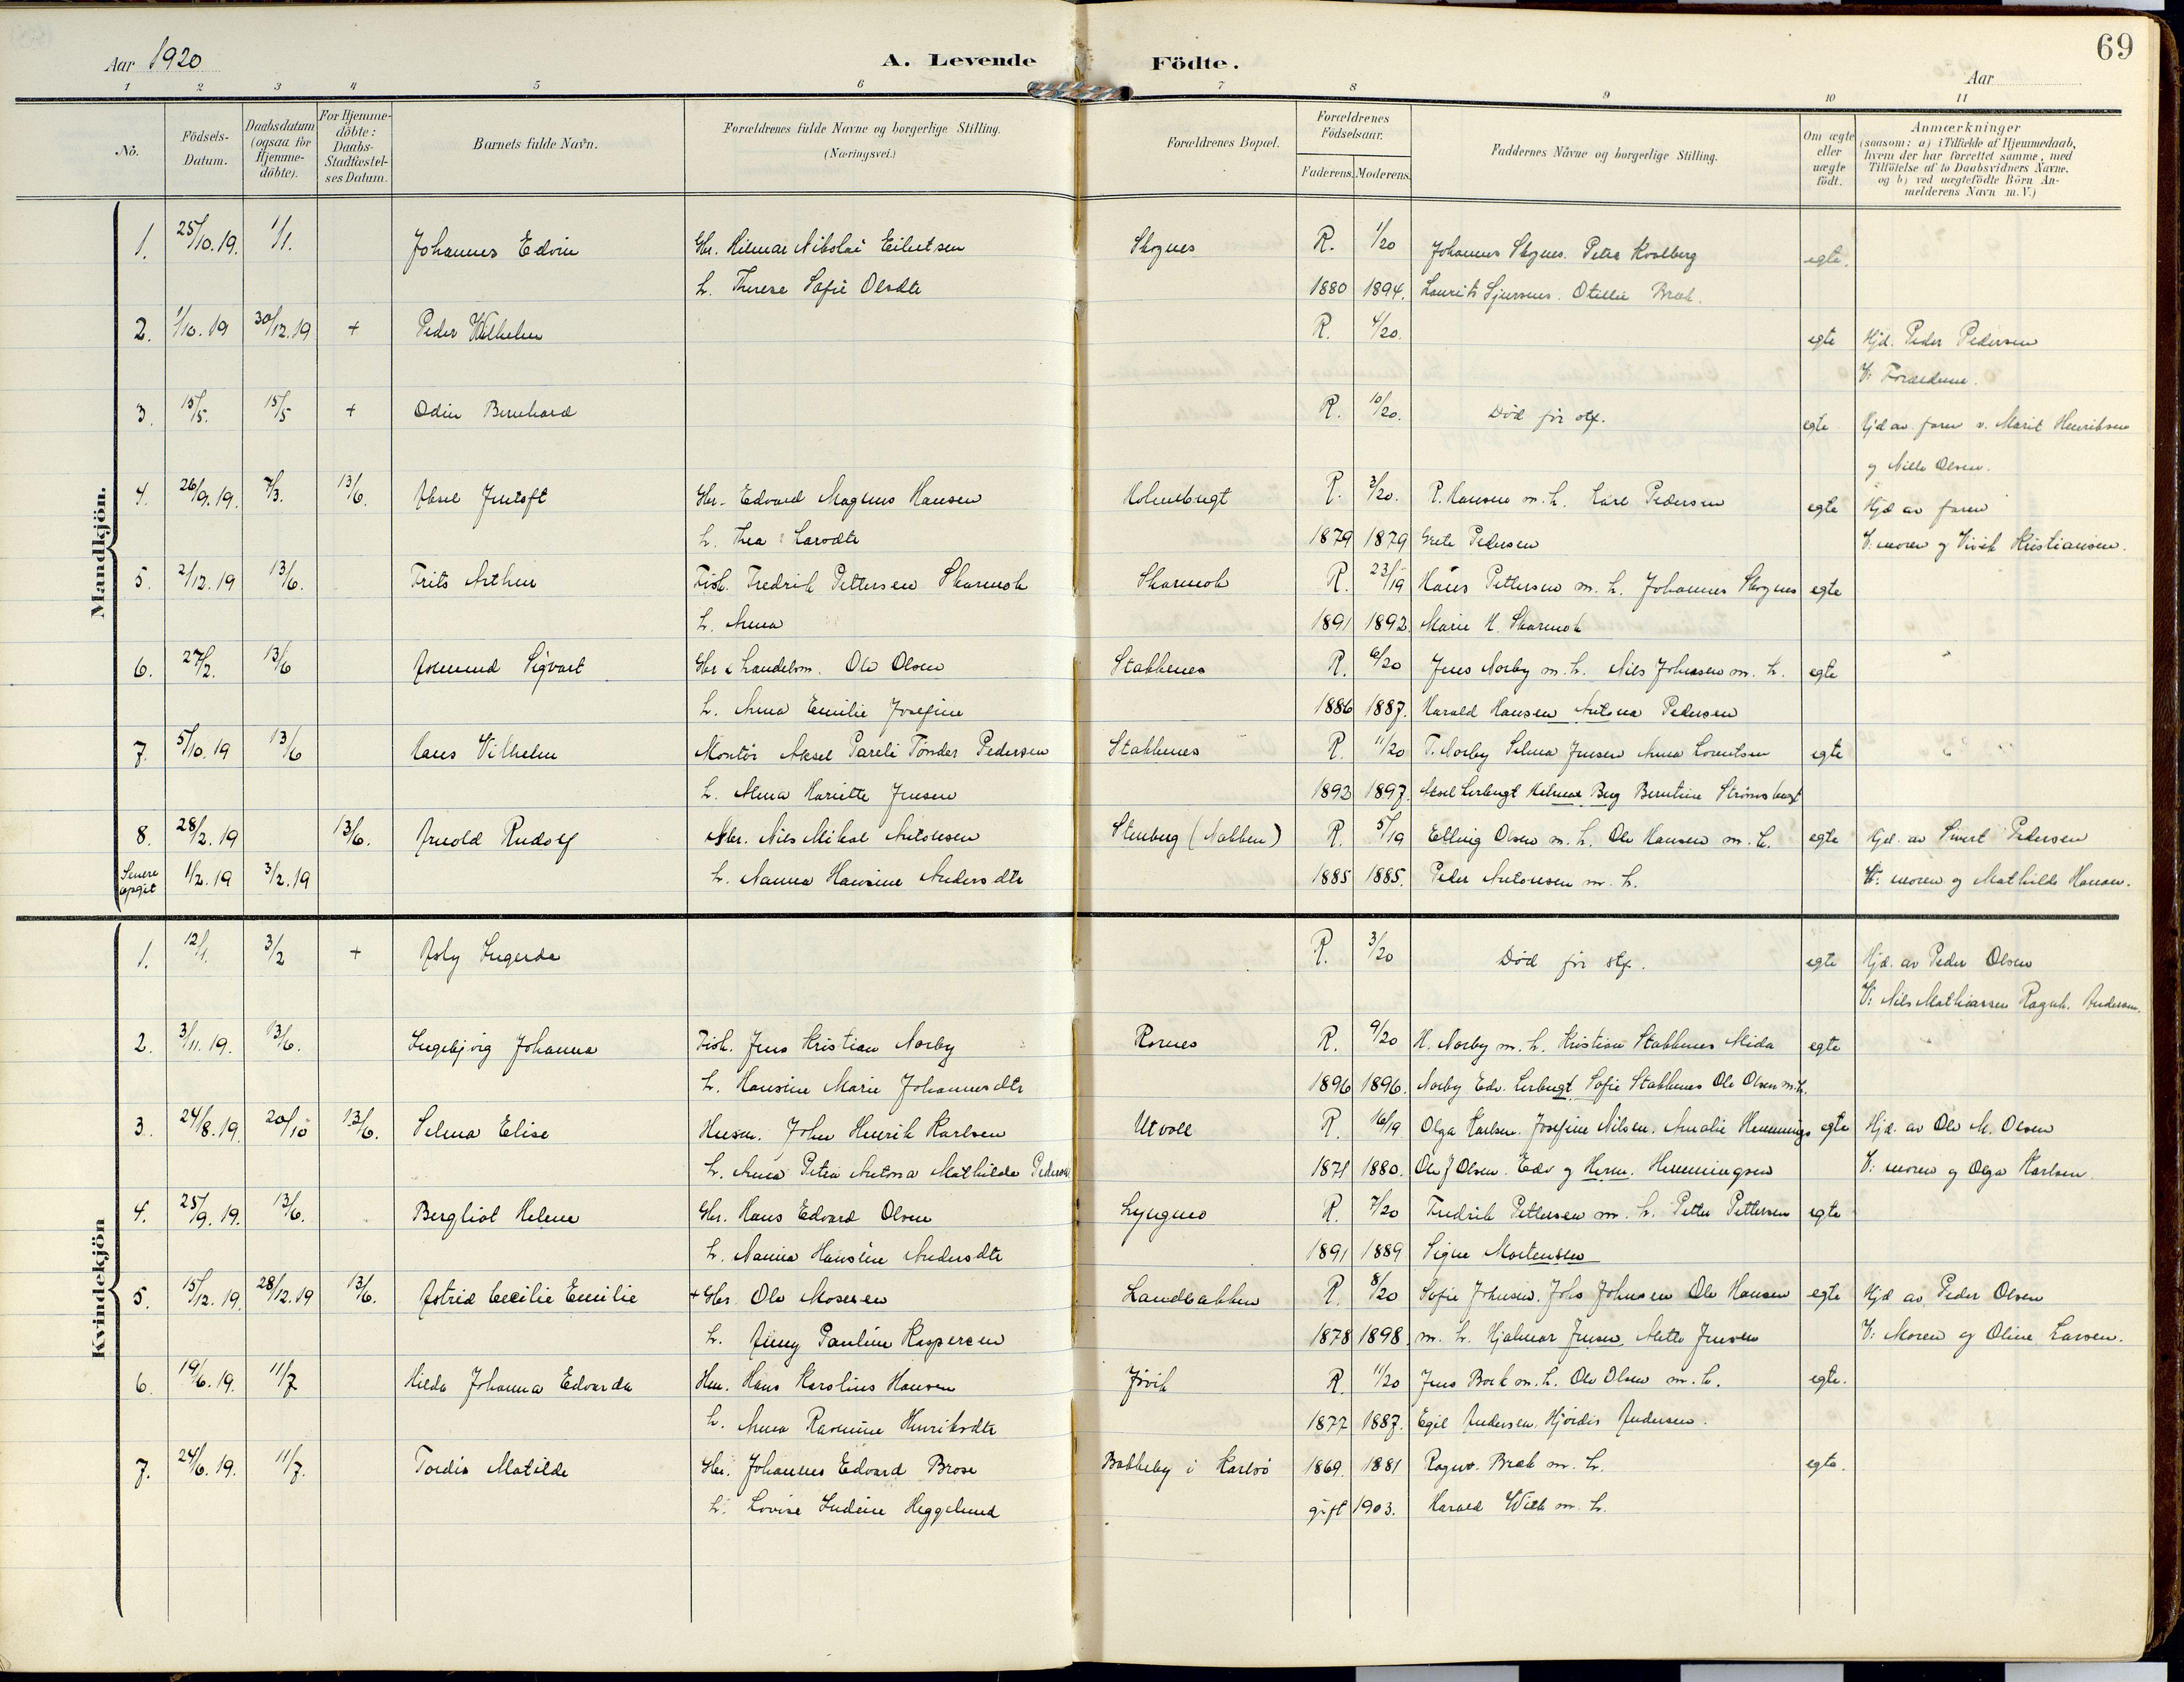 SATØ, Lyngen sokneprestembete, Ministerialbok nr. 14, 1905-1920, s. 69